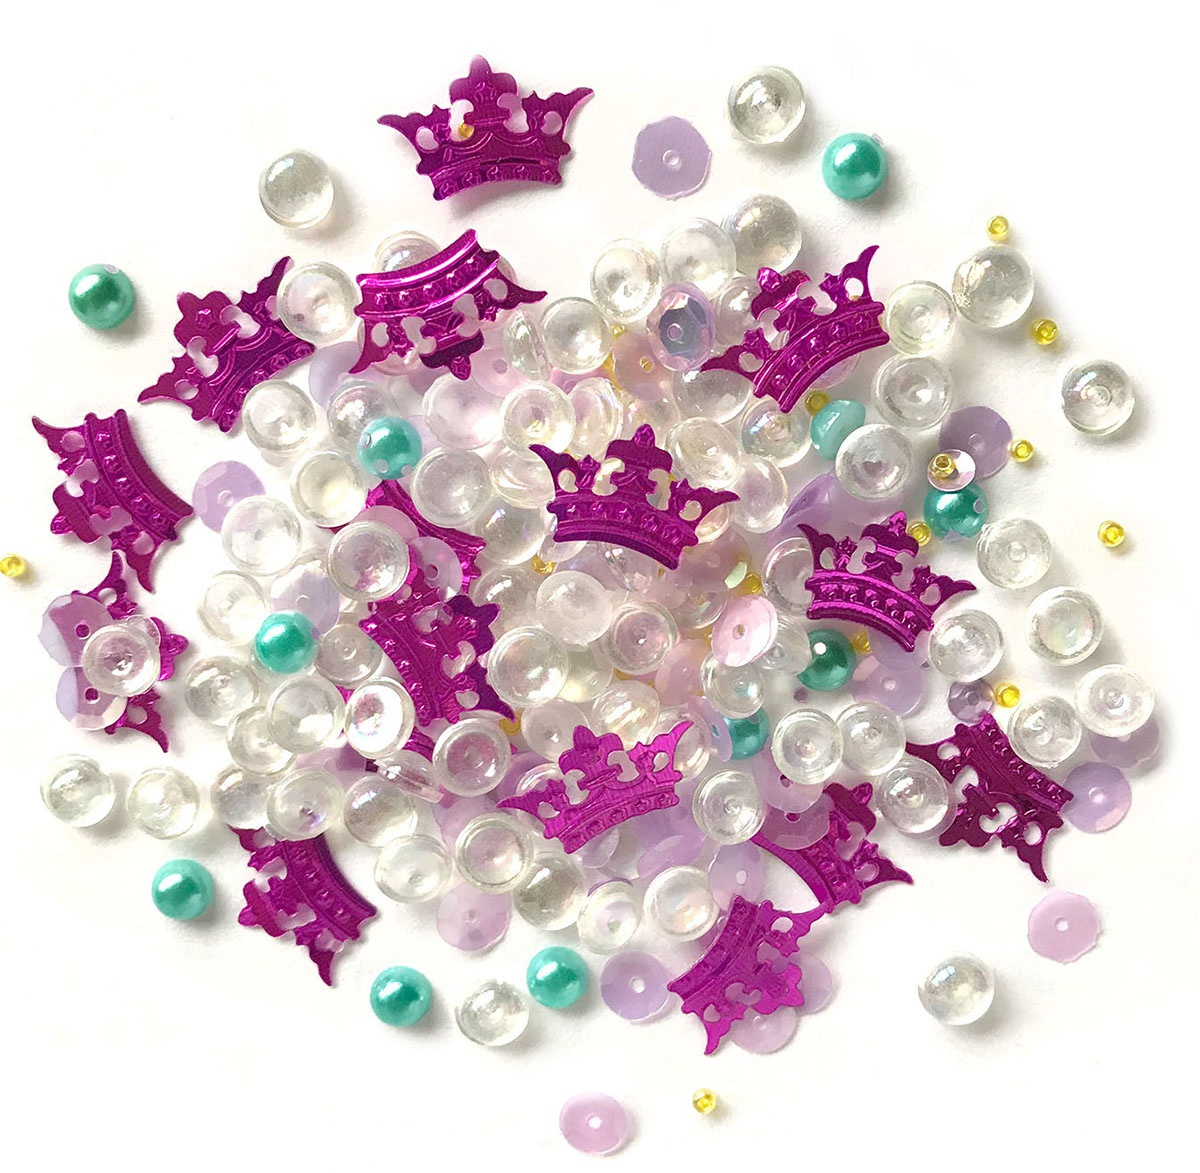 Sparkletz Embellishment Pack 10g-Princess Dreams